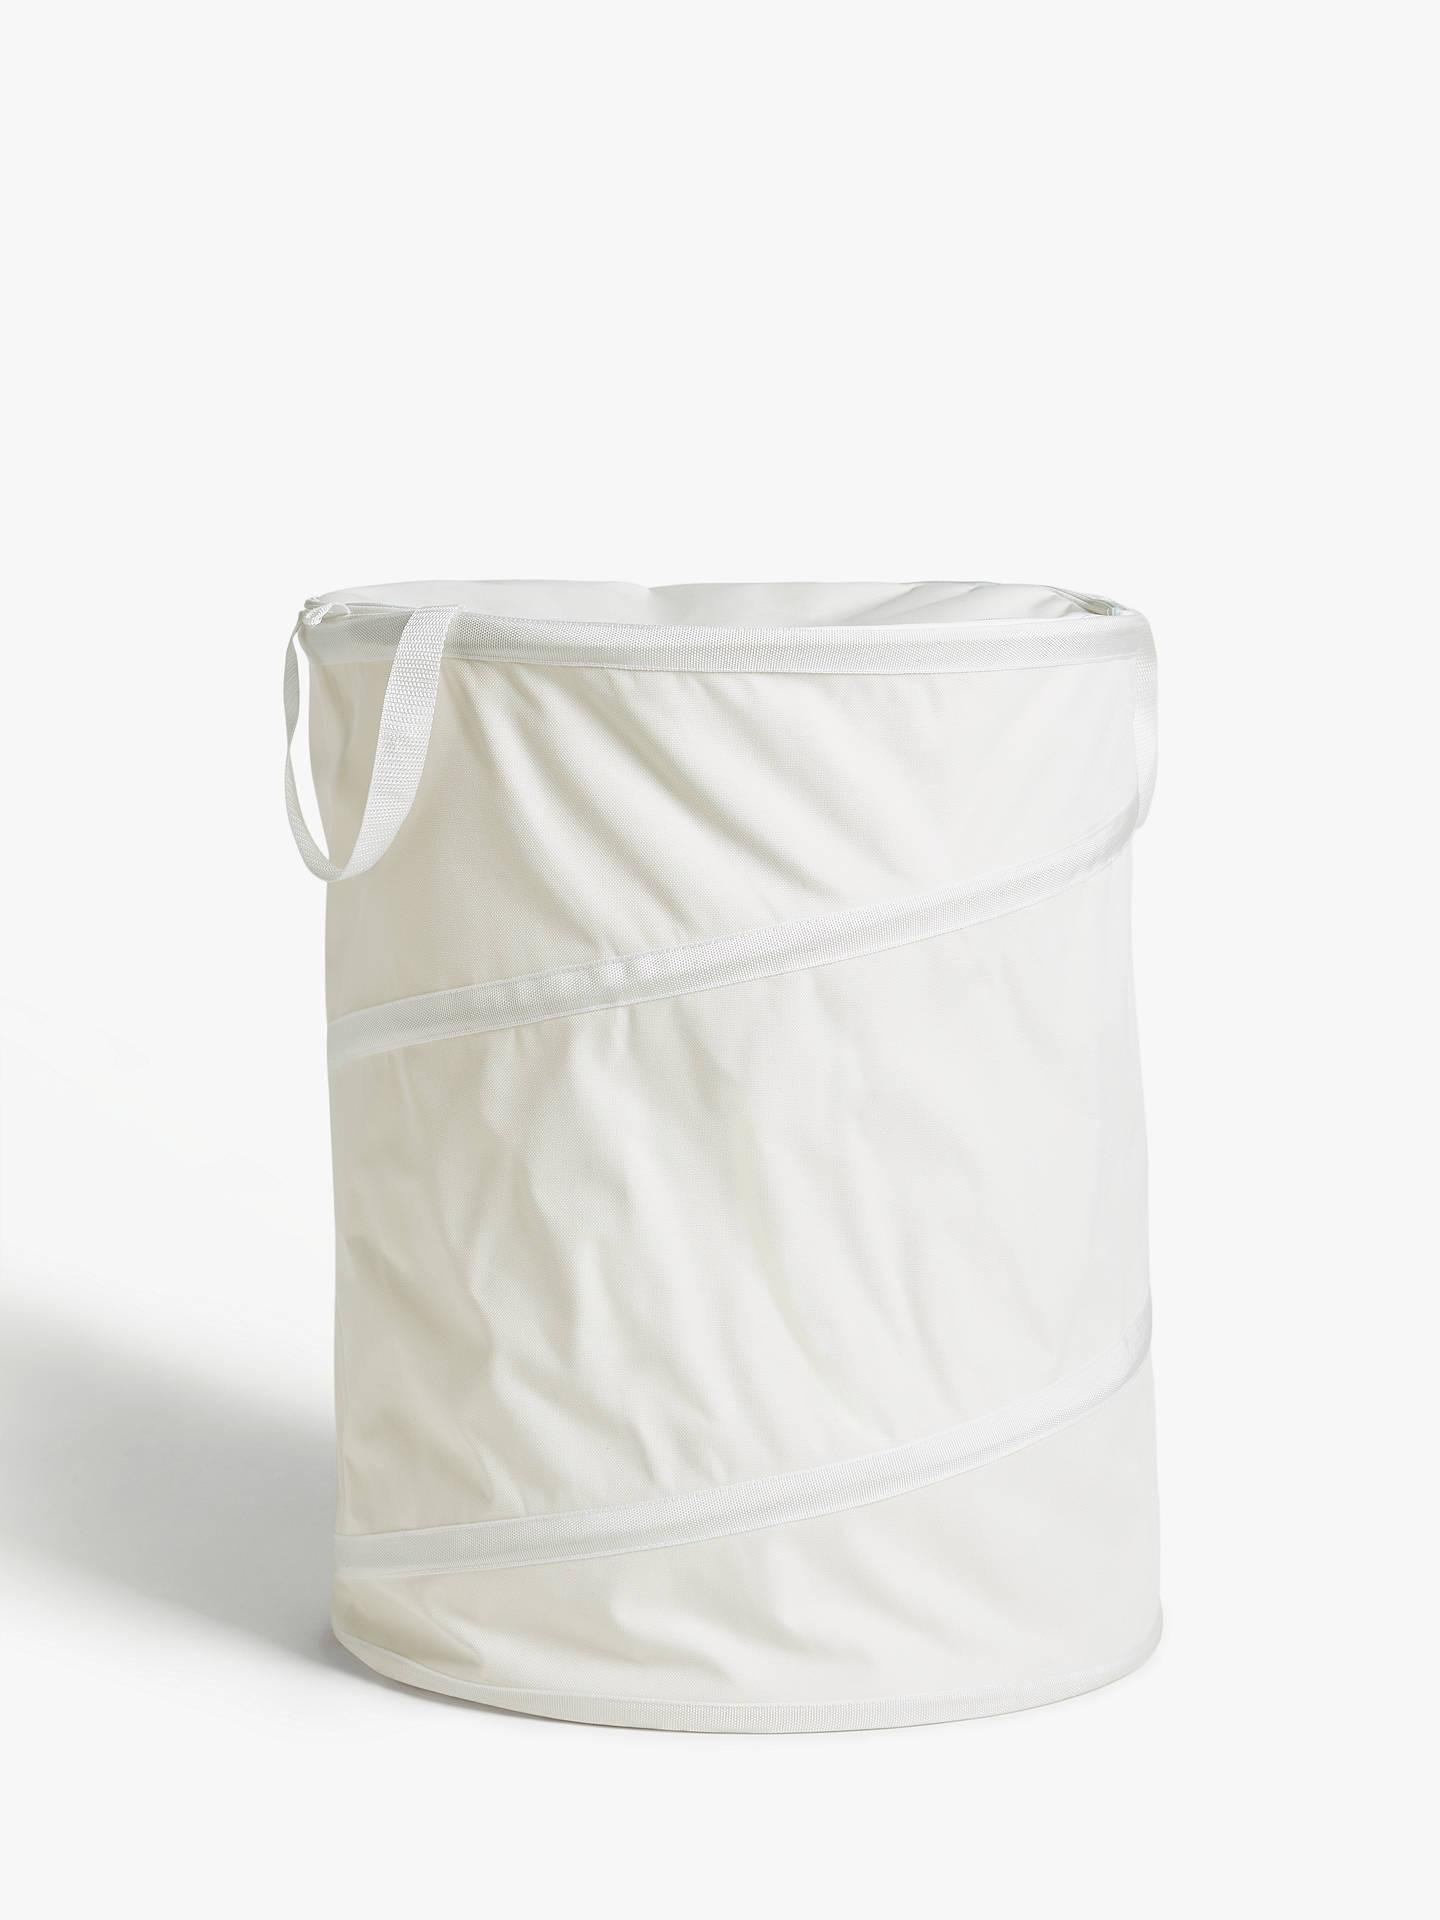 John Lewis Partners Pop Up Laundry